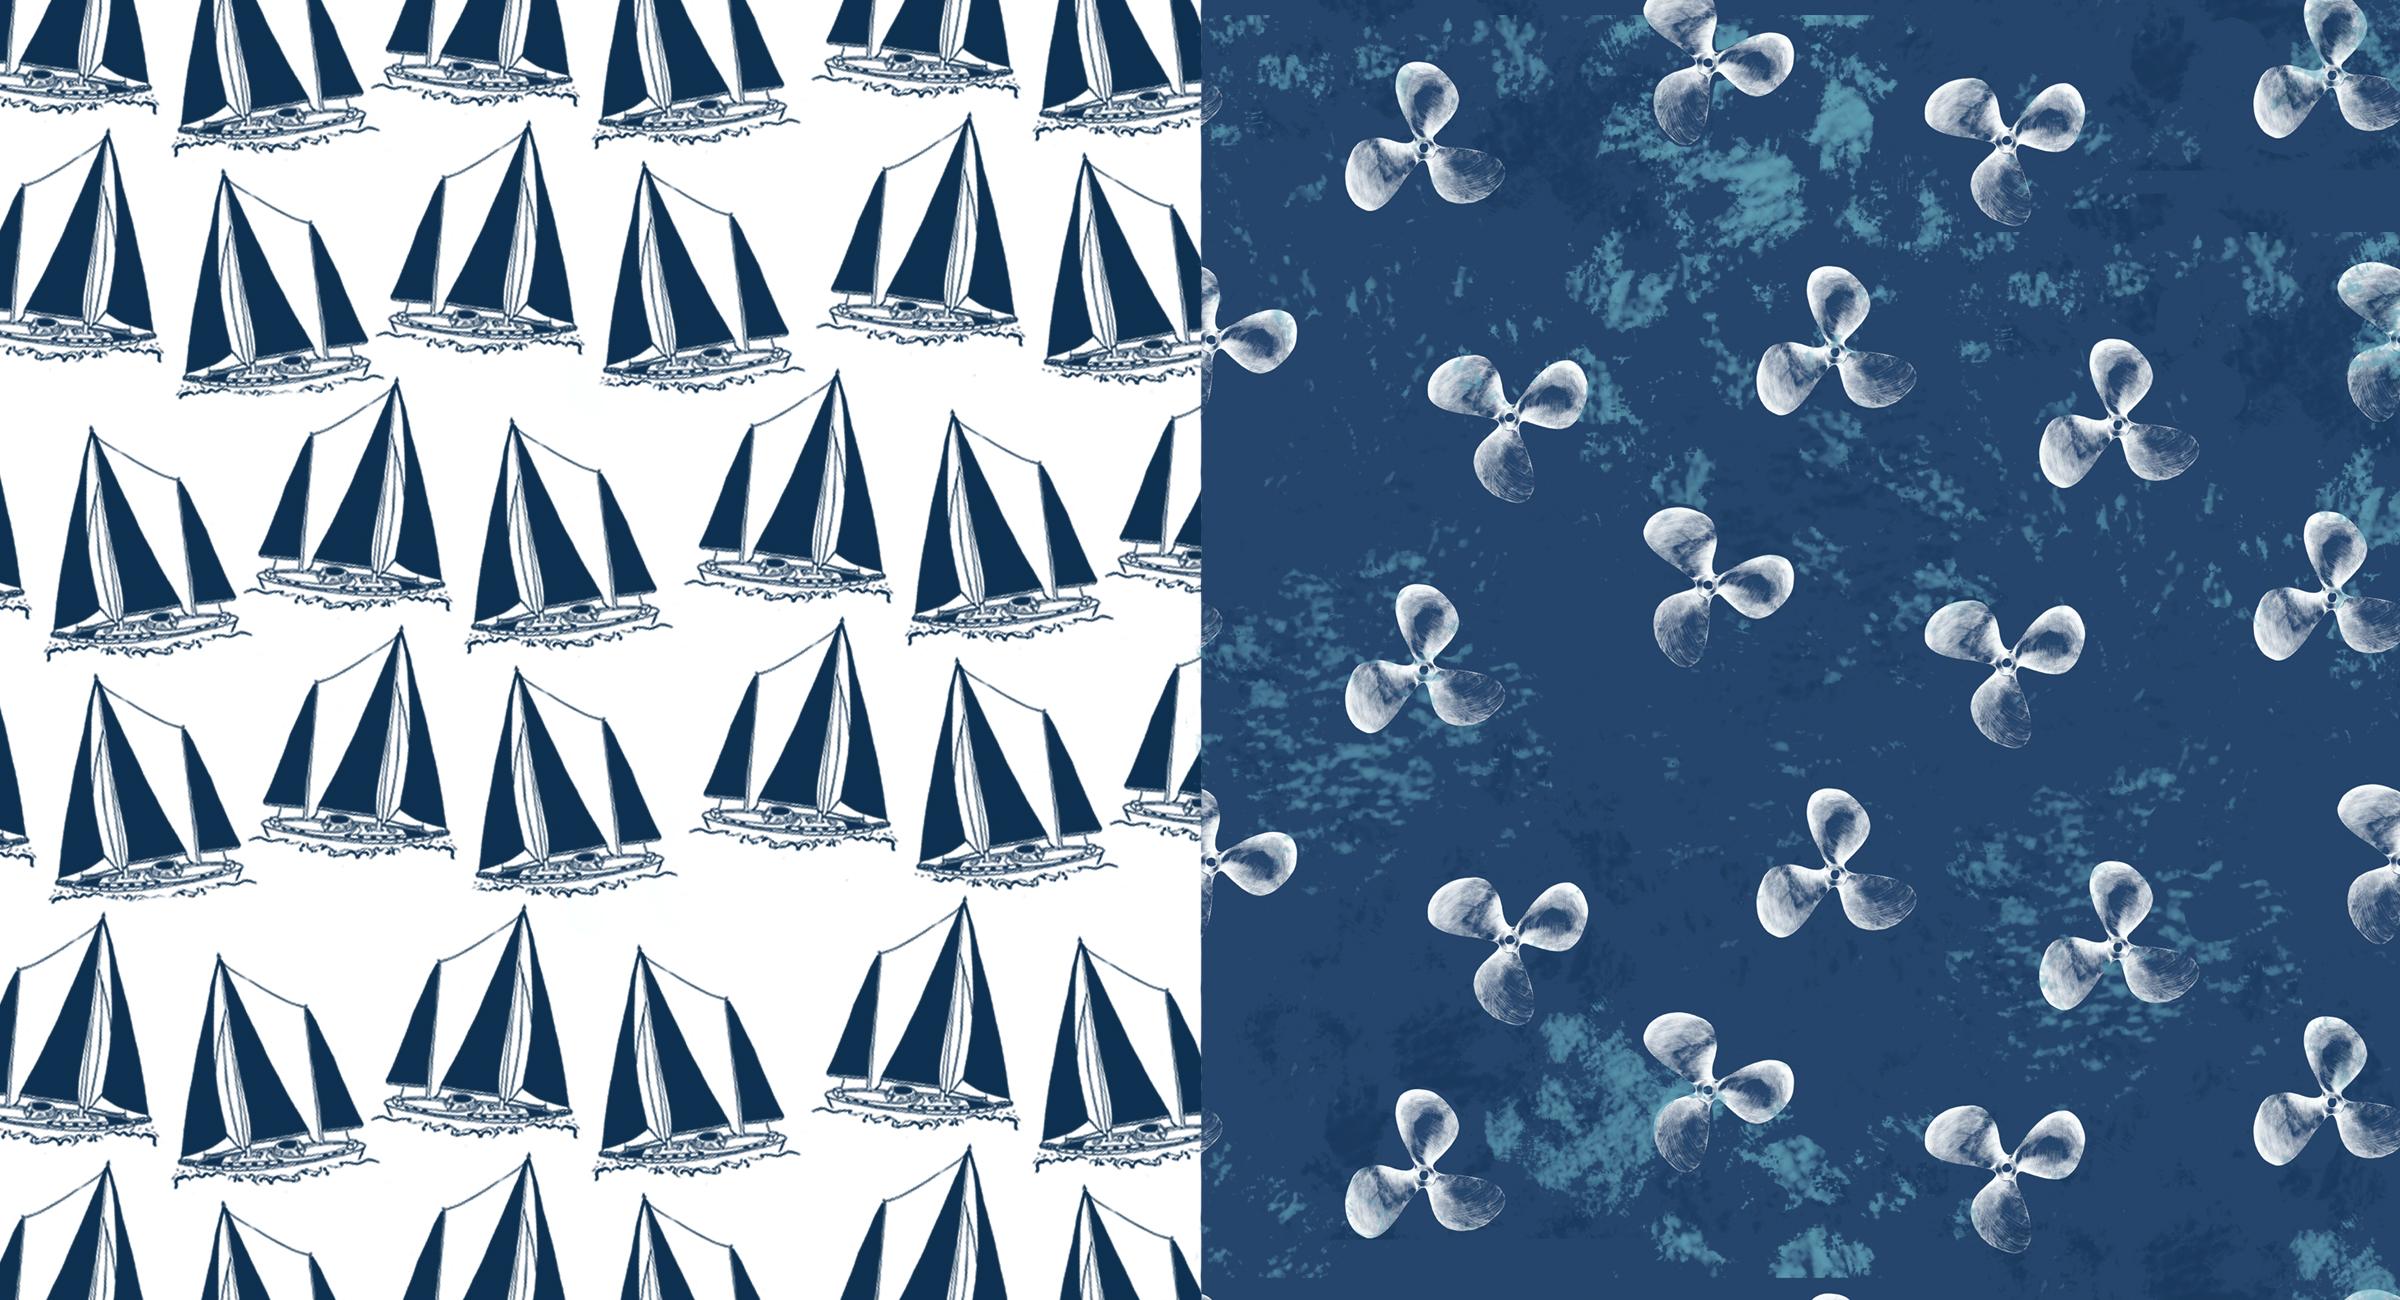 Nautical_webboards1